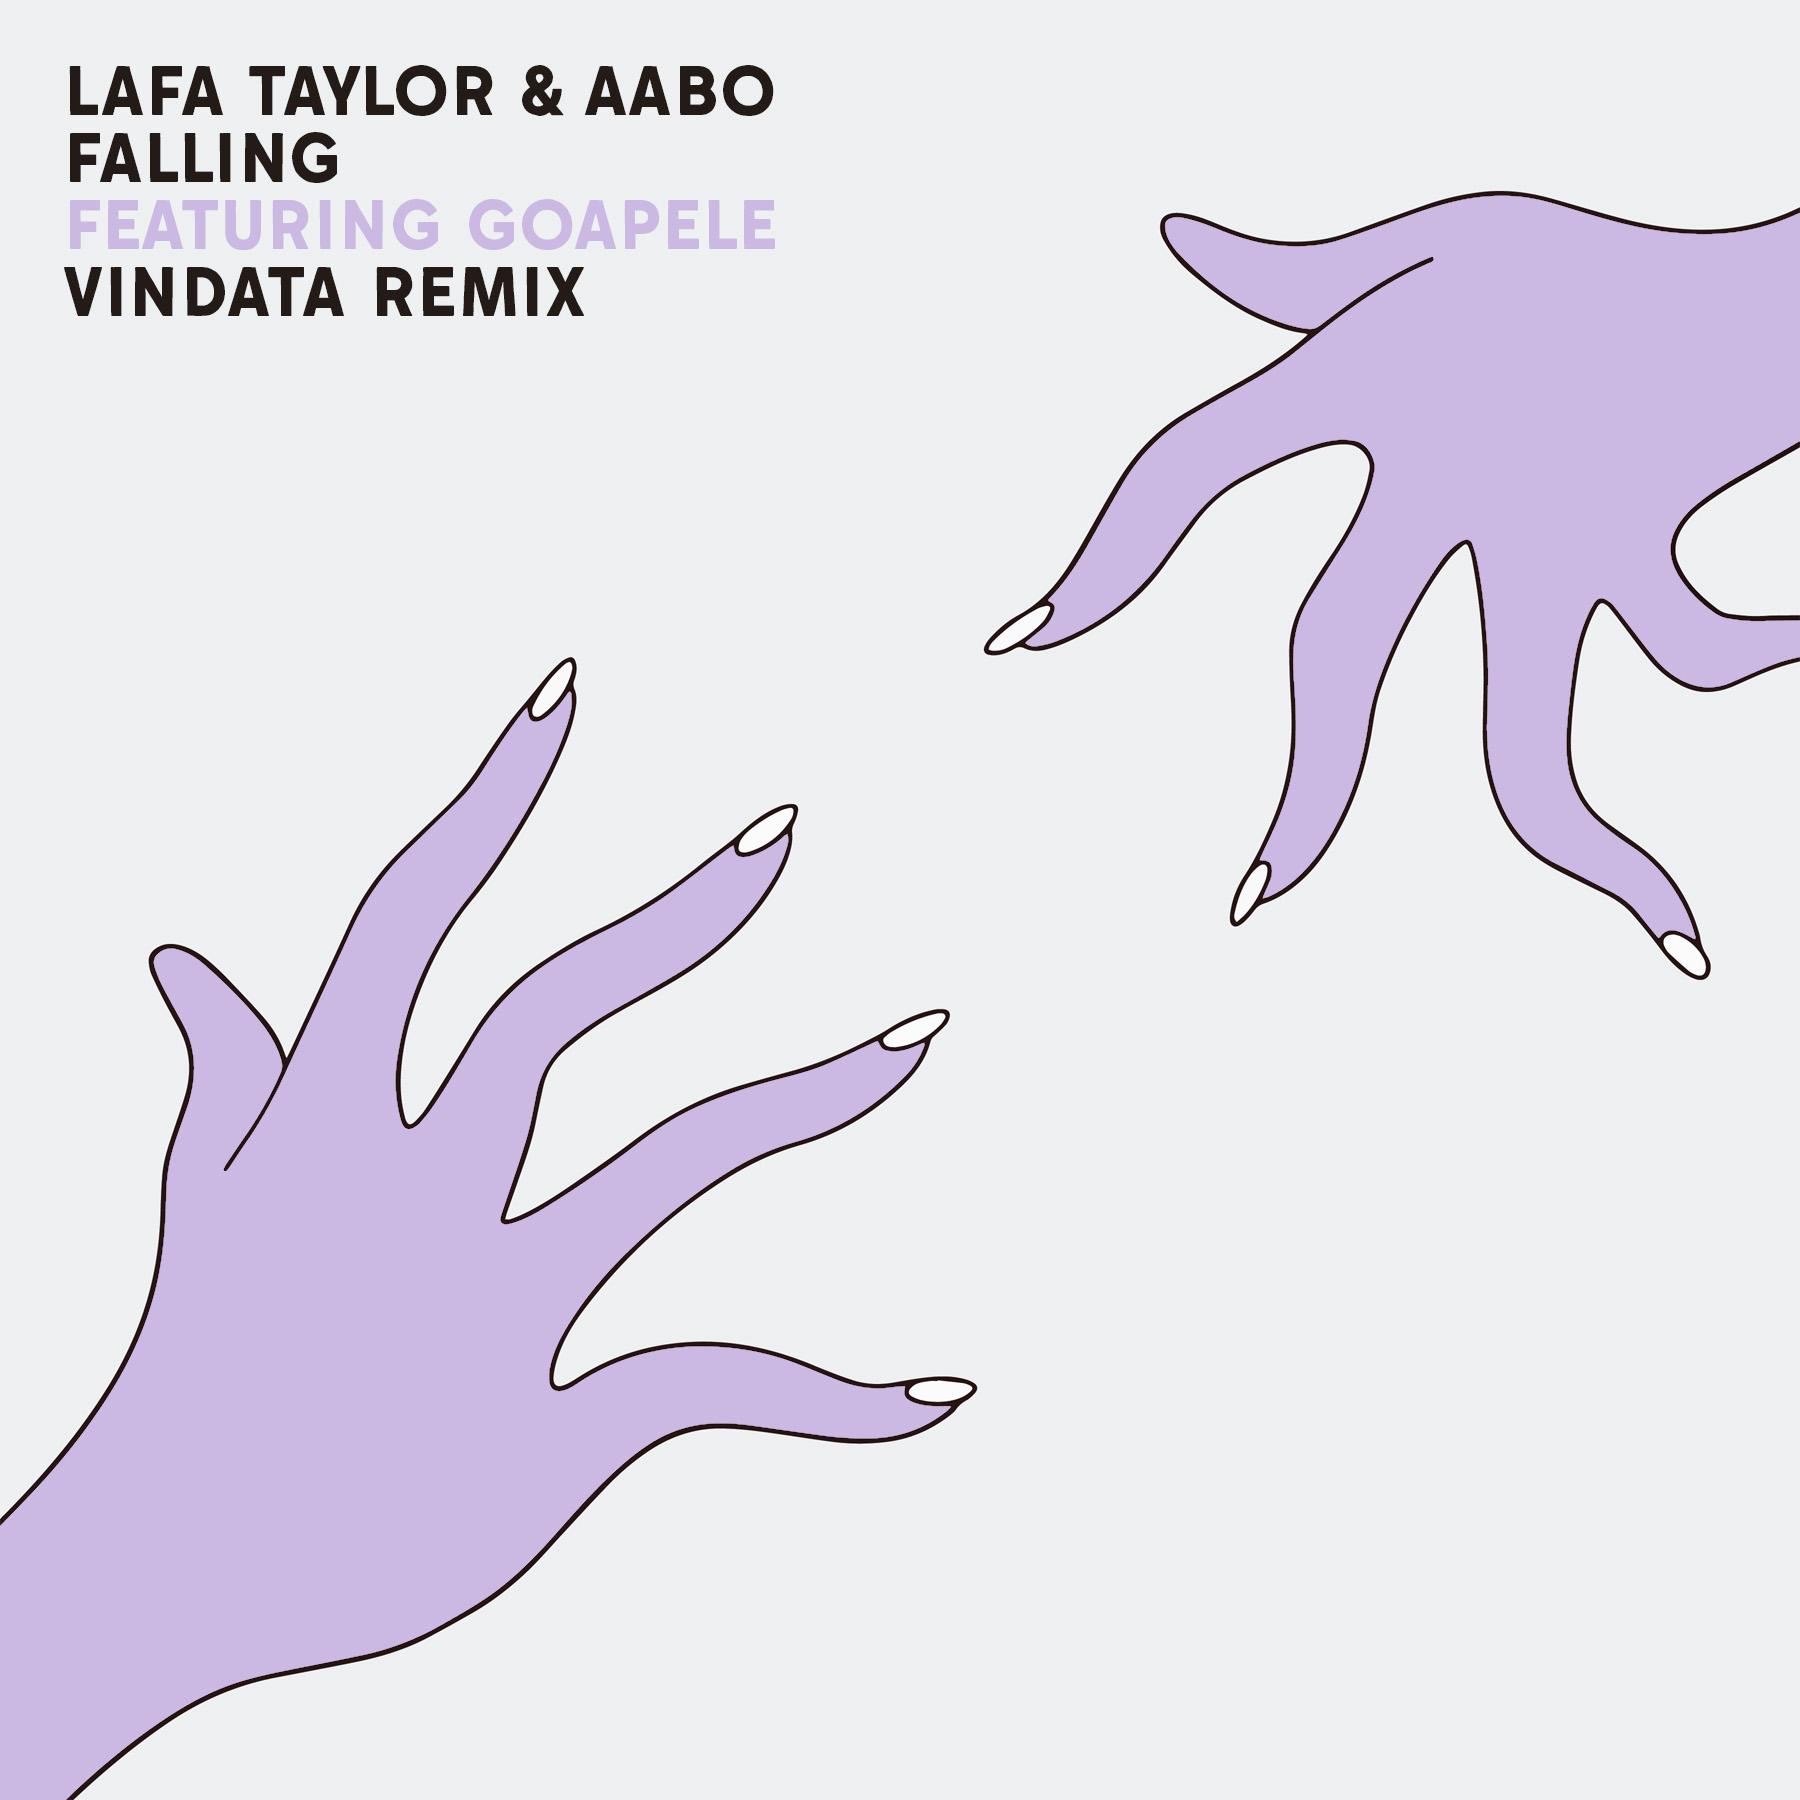 Lafa Taylor & Aab - Falling - Vindata Remix